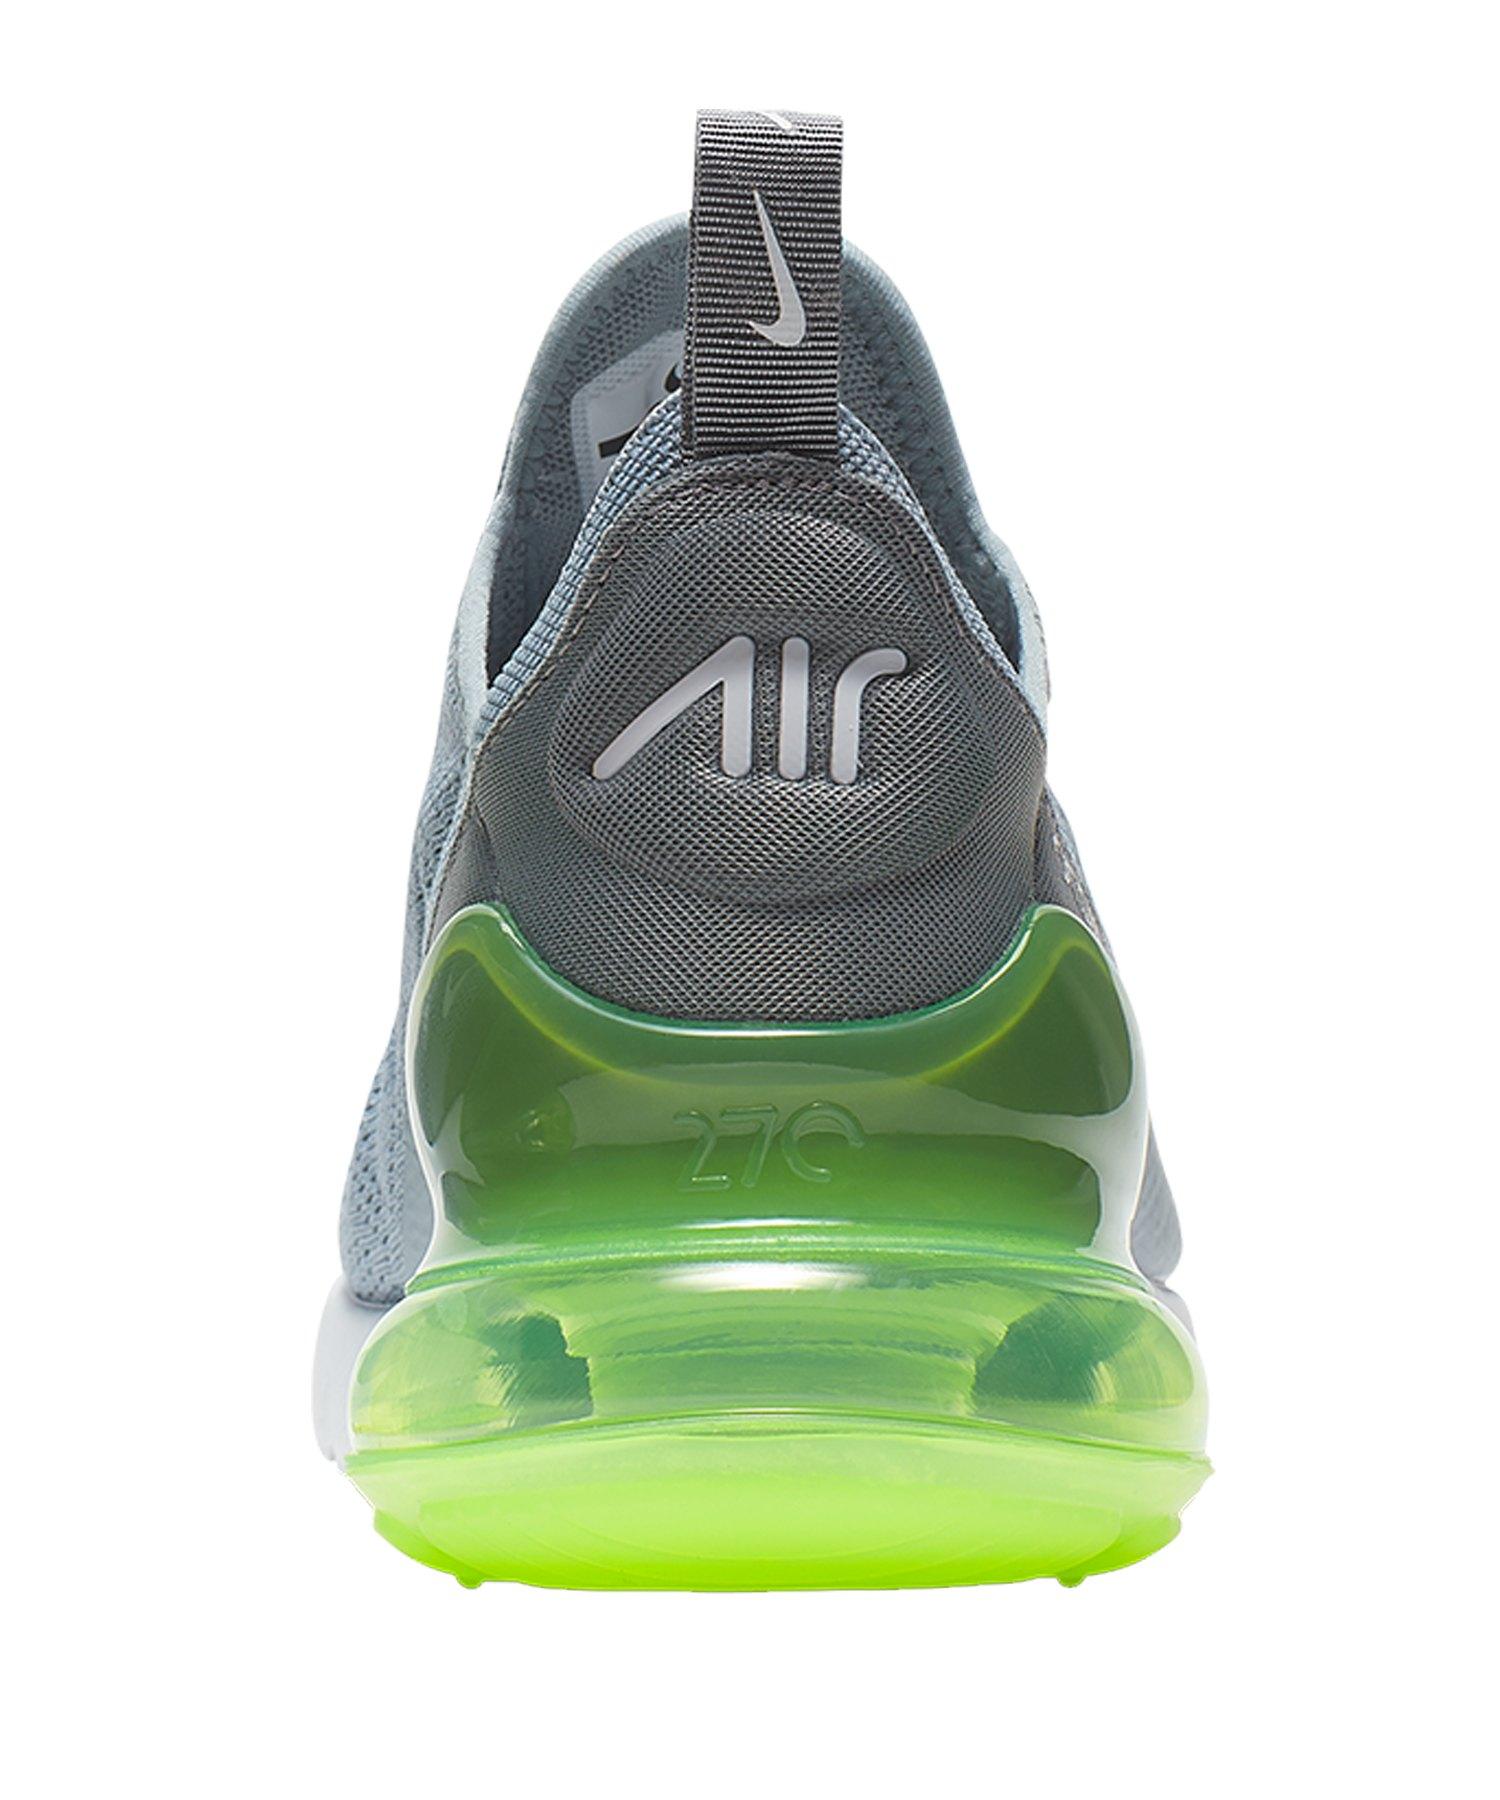 Max Damen Sneaker Grau Air F404 270 Nike htsrCdQ